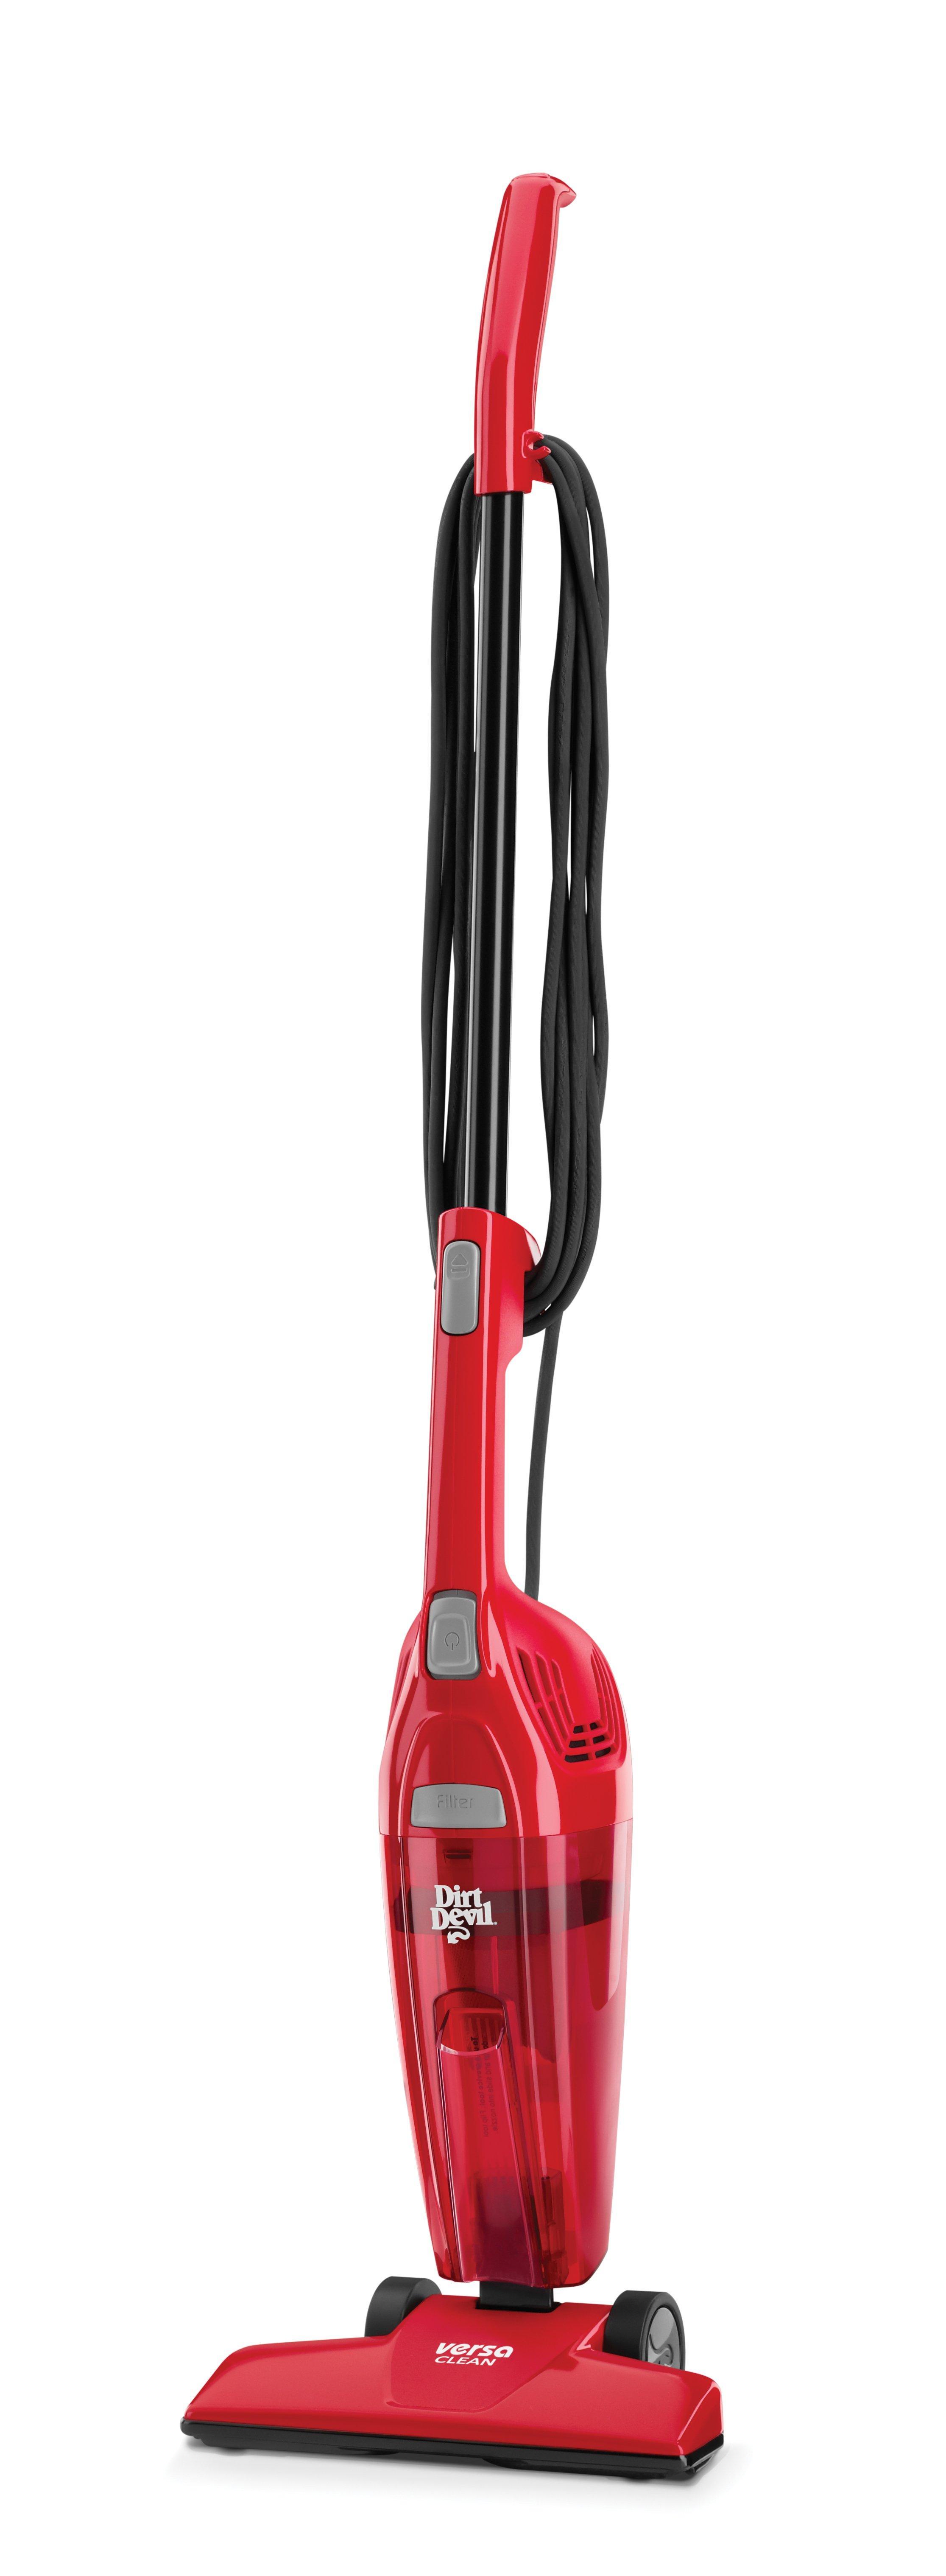 Versa Clean Corded Stick Vacuum2